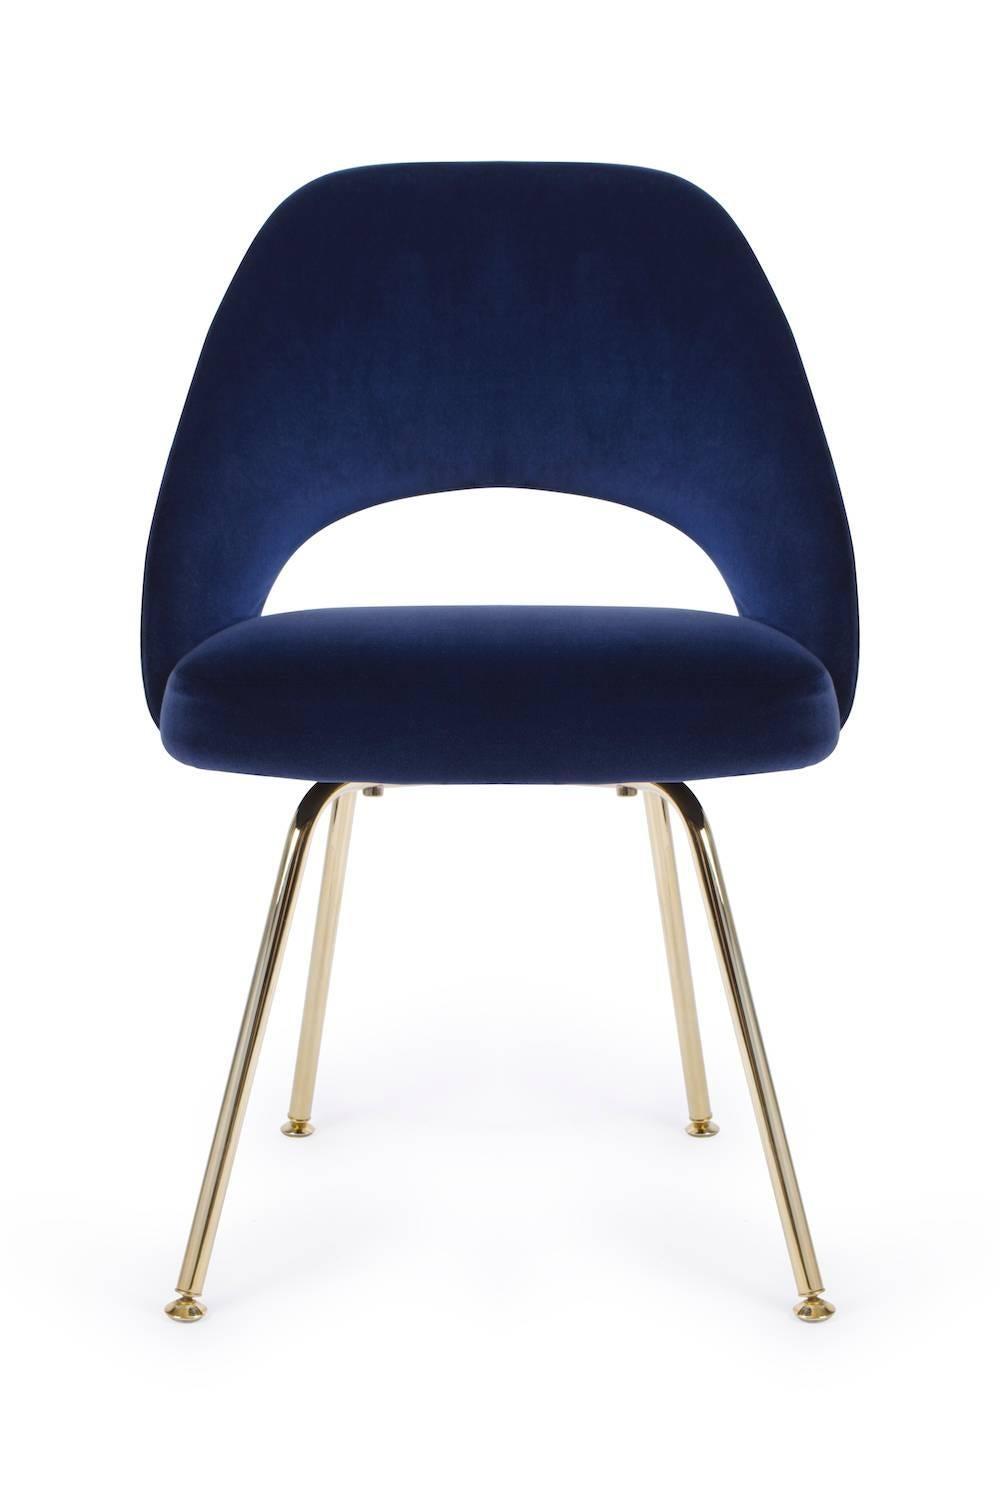 Saarinen Executive Armless Chair In Navy Velvet 24k Gold Edition